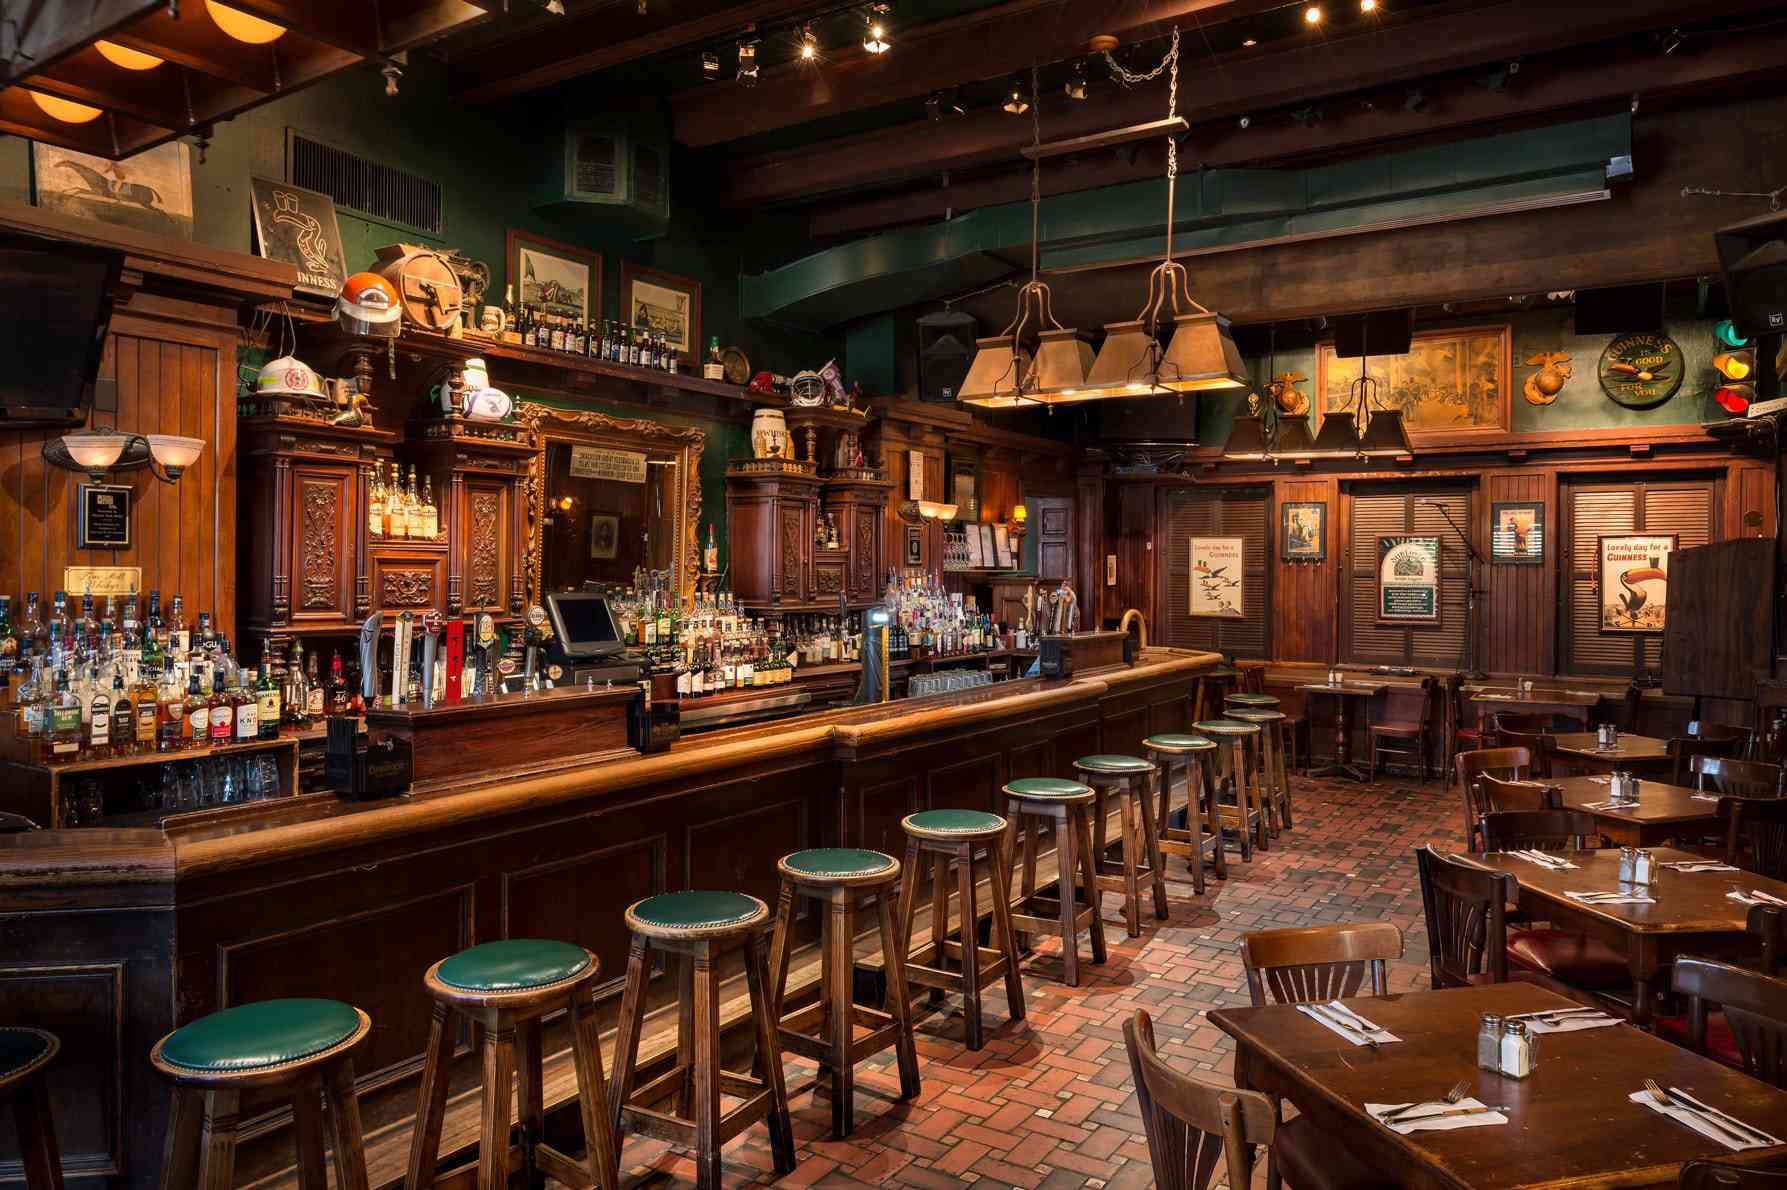 The Dubliner Restaurant & Pub